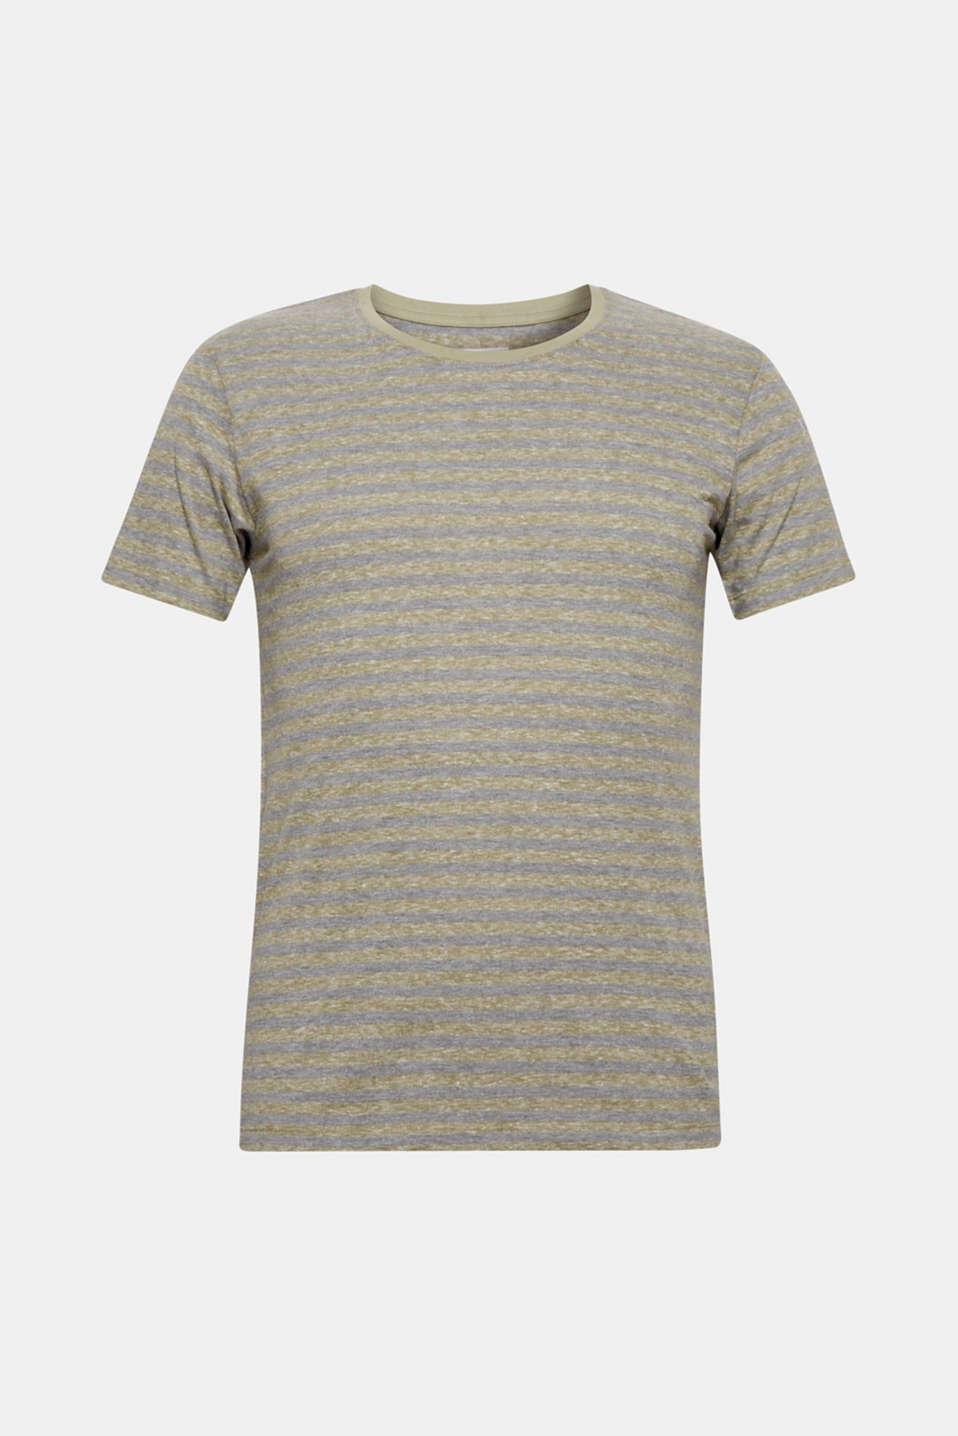 T-Shirts, OLIVE, detail image number 7